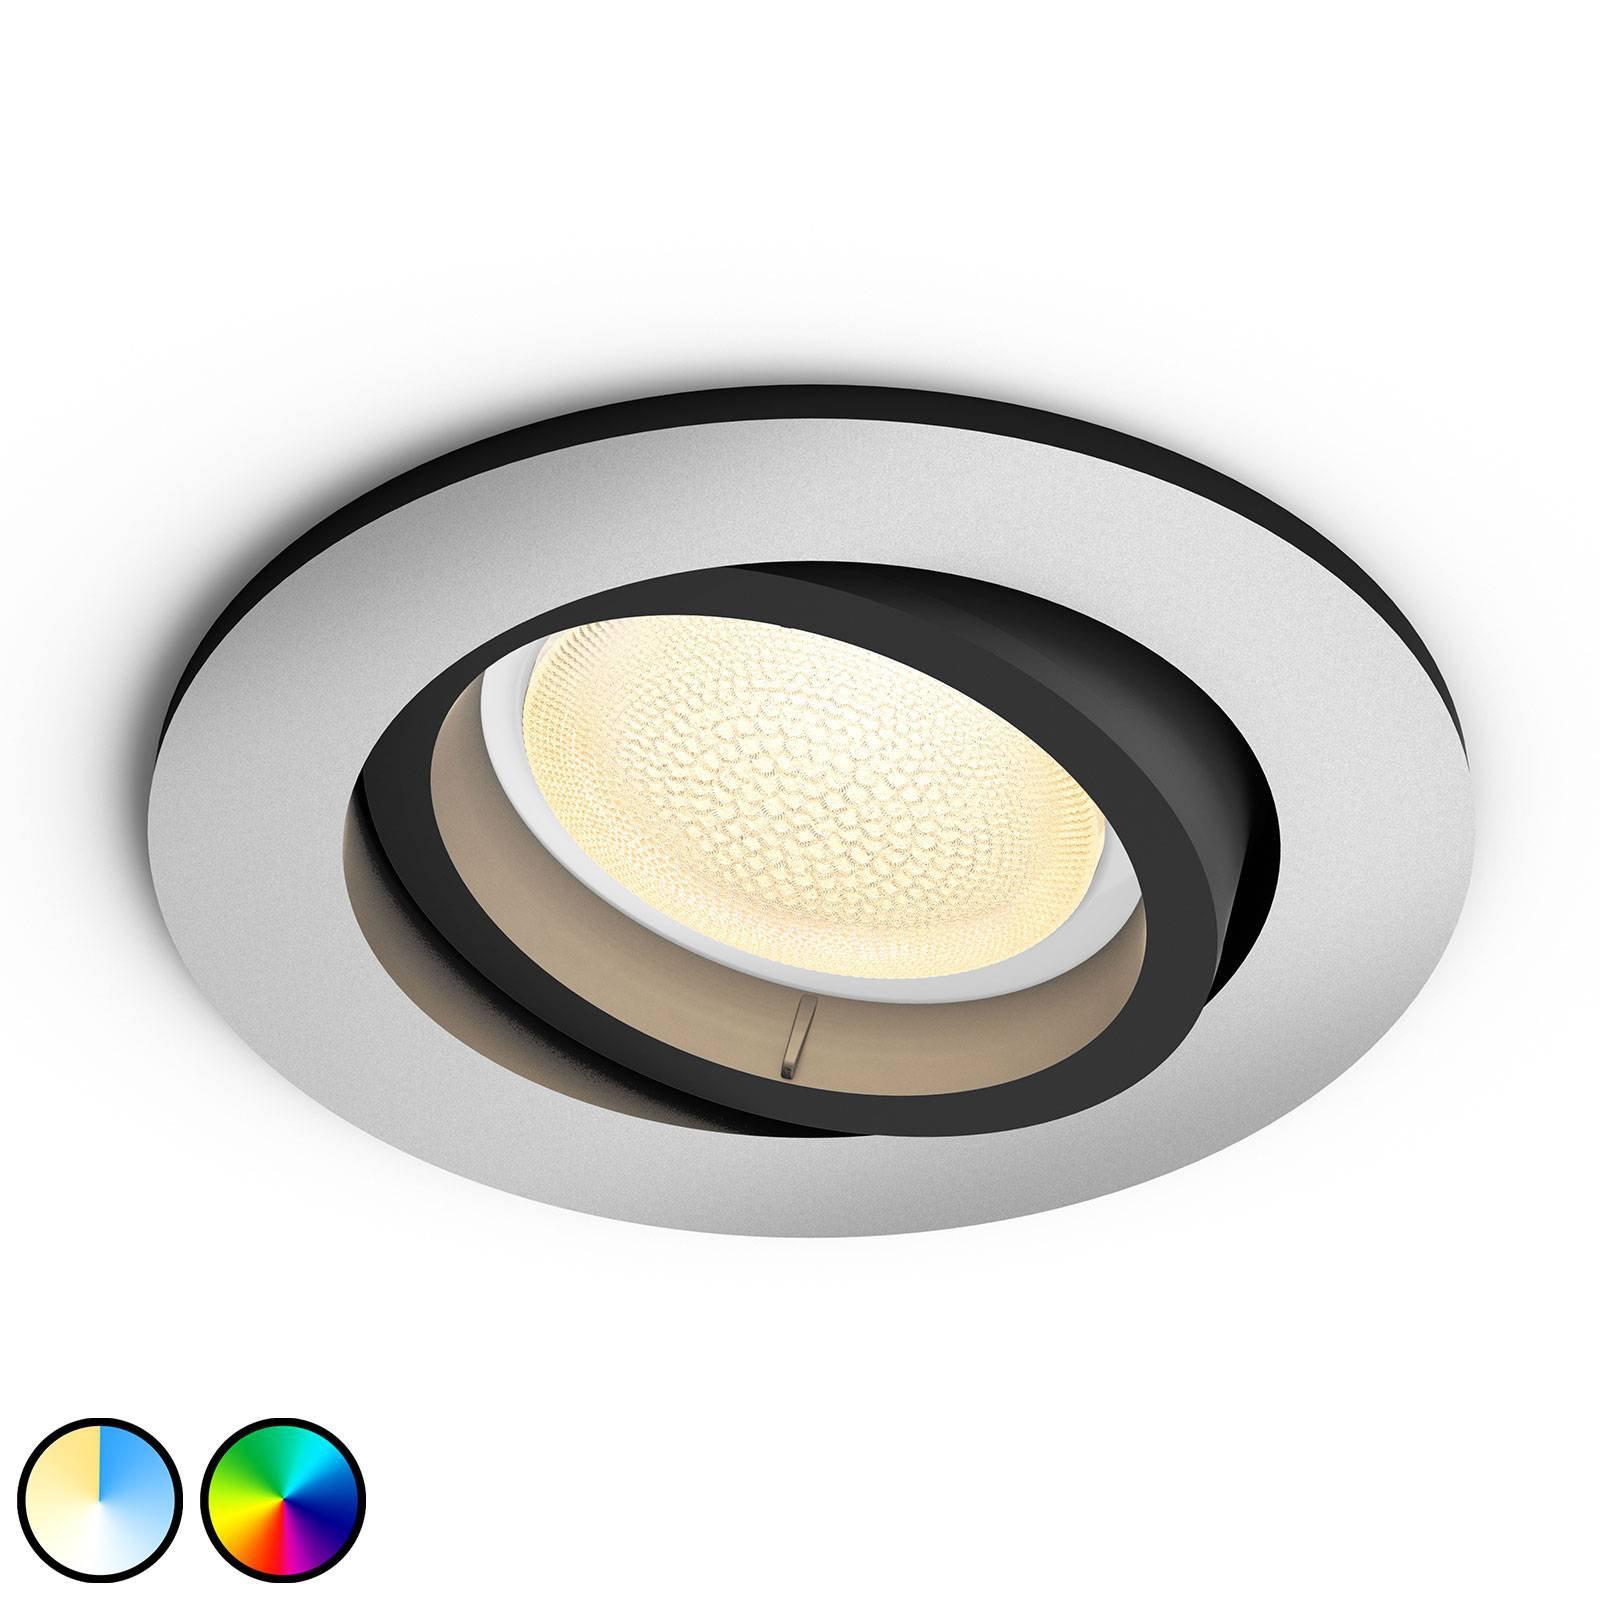 Philips Hue Centura LED-downlight rund, aluminium